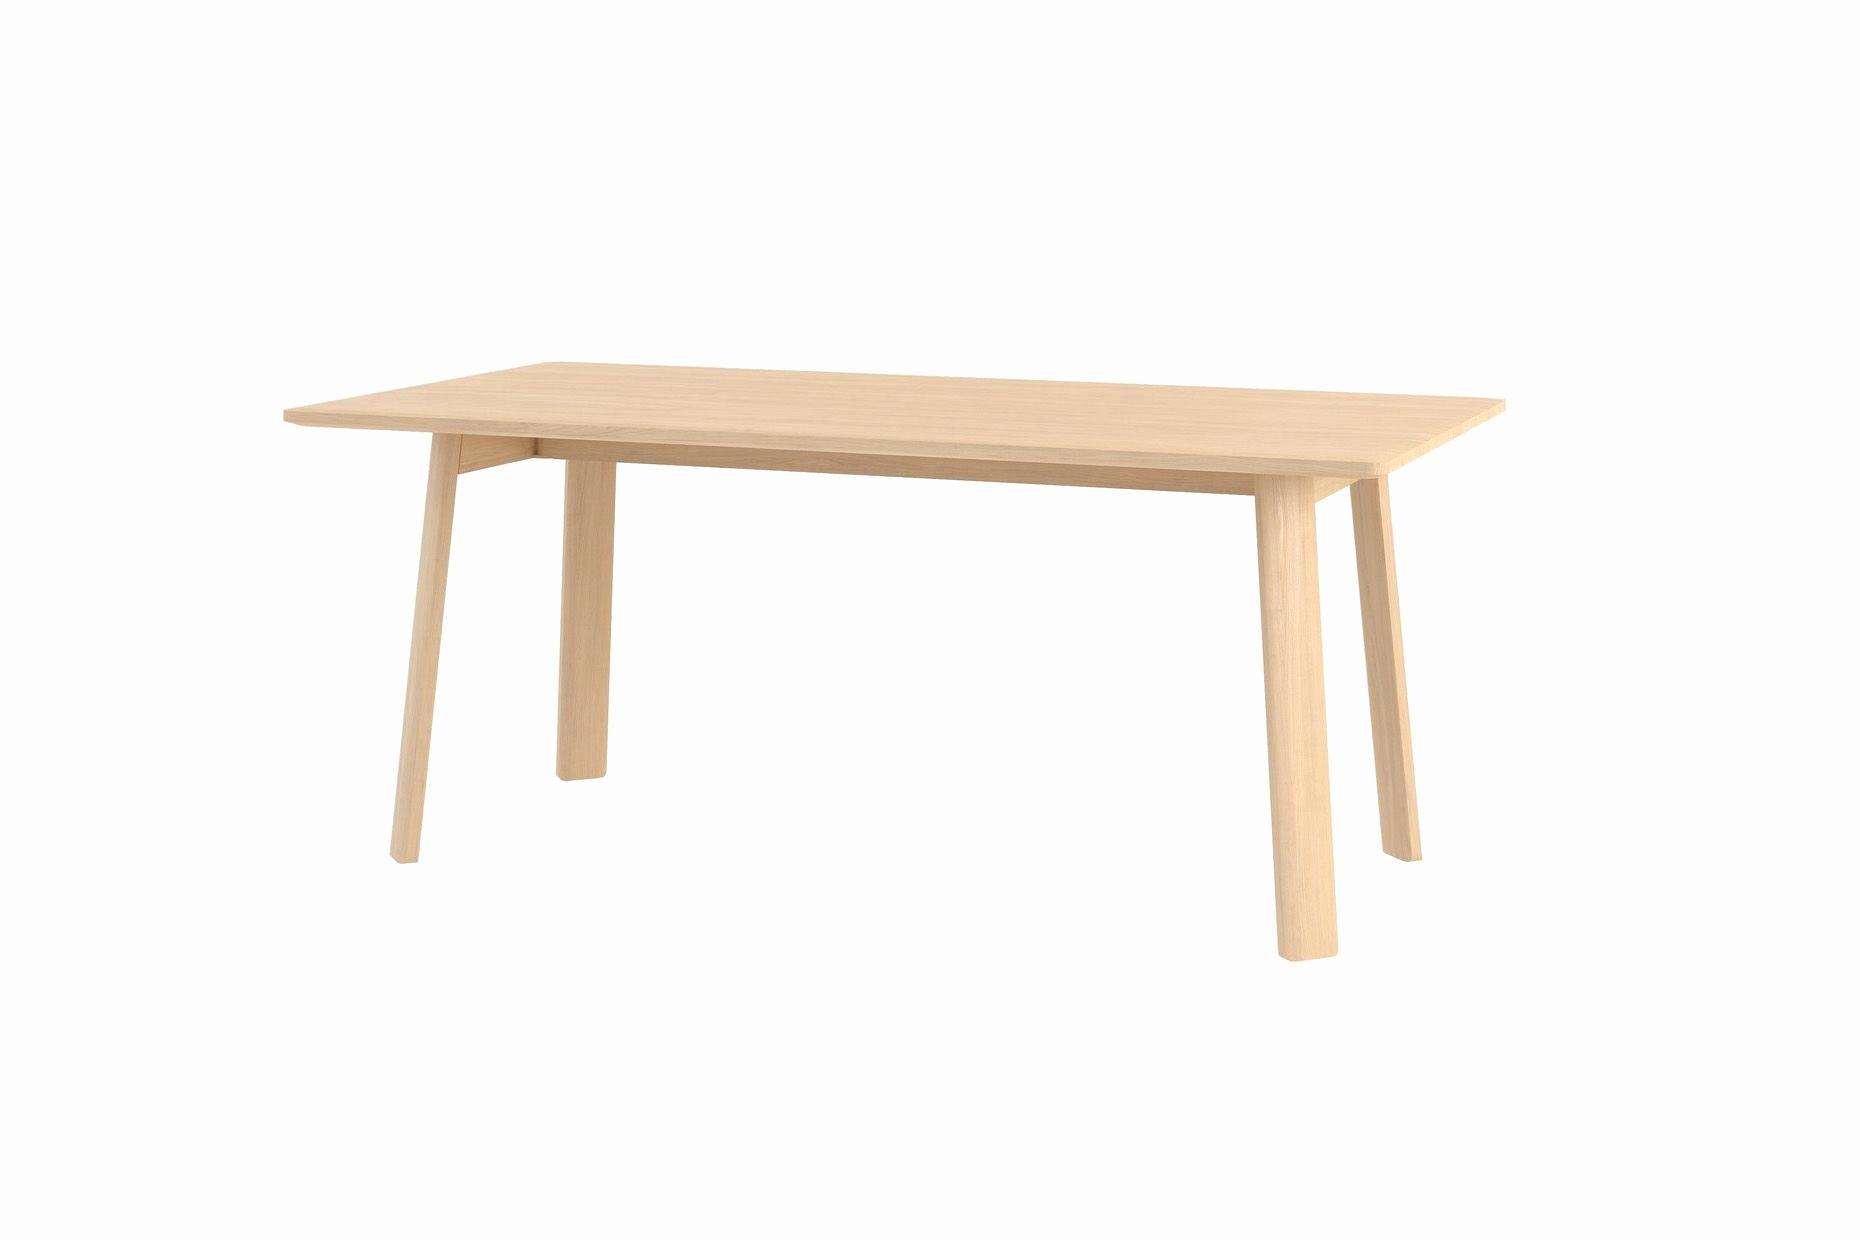 Table Pliante Cuisine Ikea Nouveau Unique Ikea Metal Table ... intérieur Table De Jardin Pliante En Bois